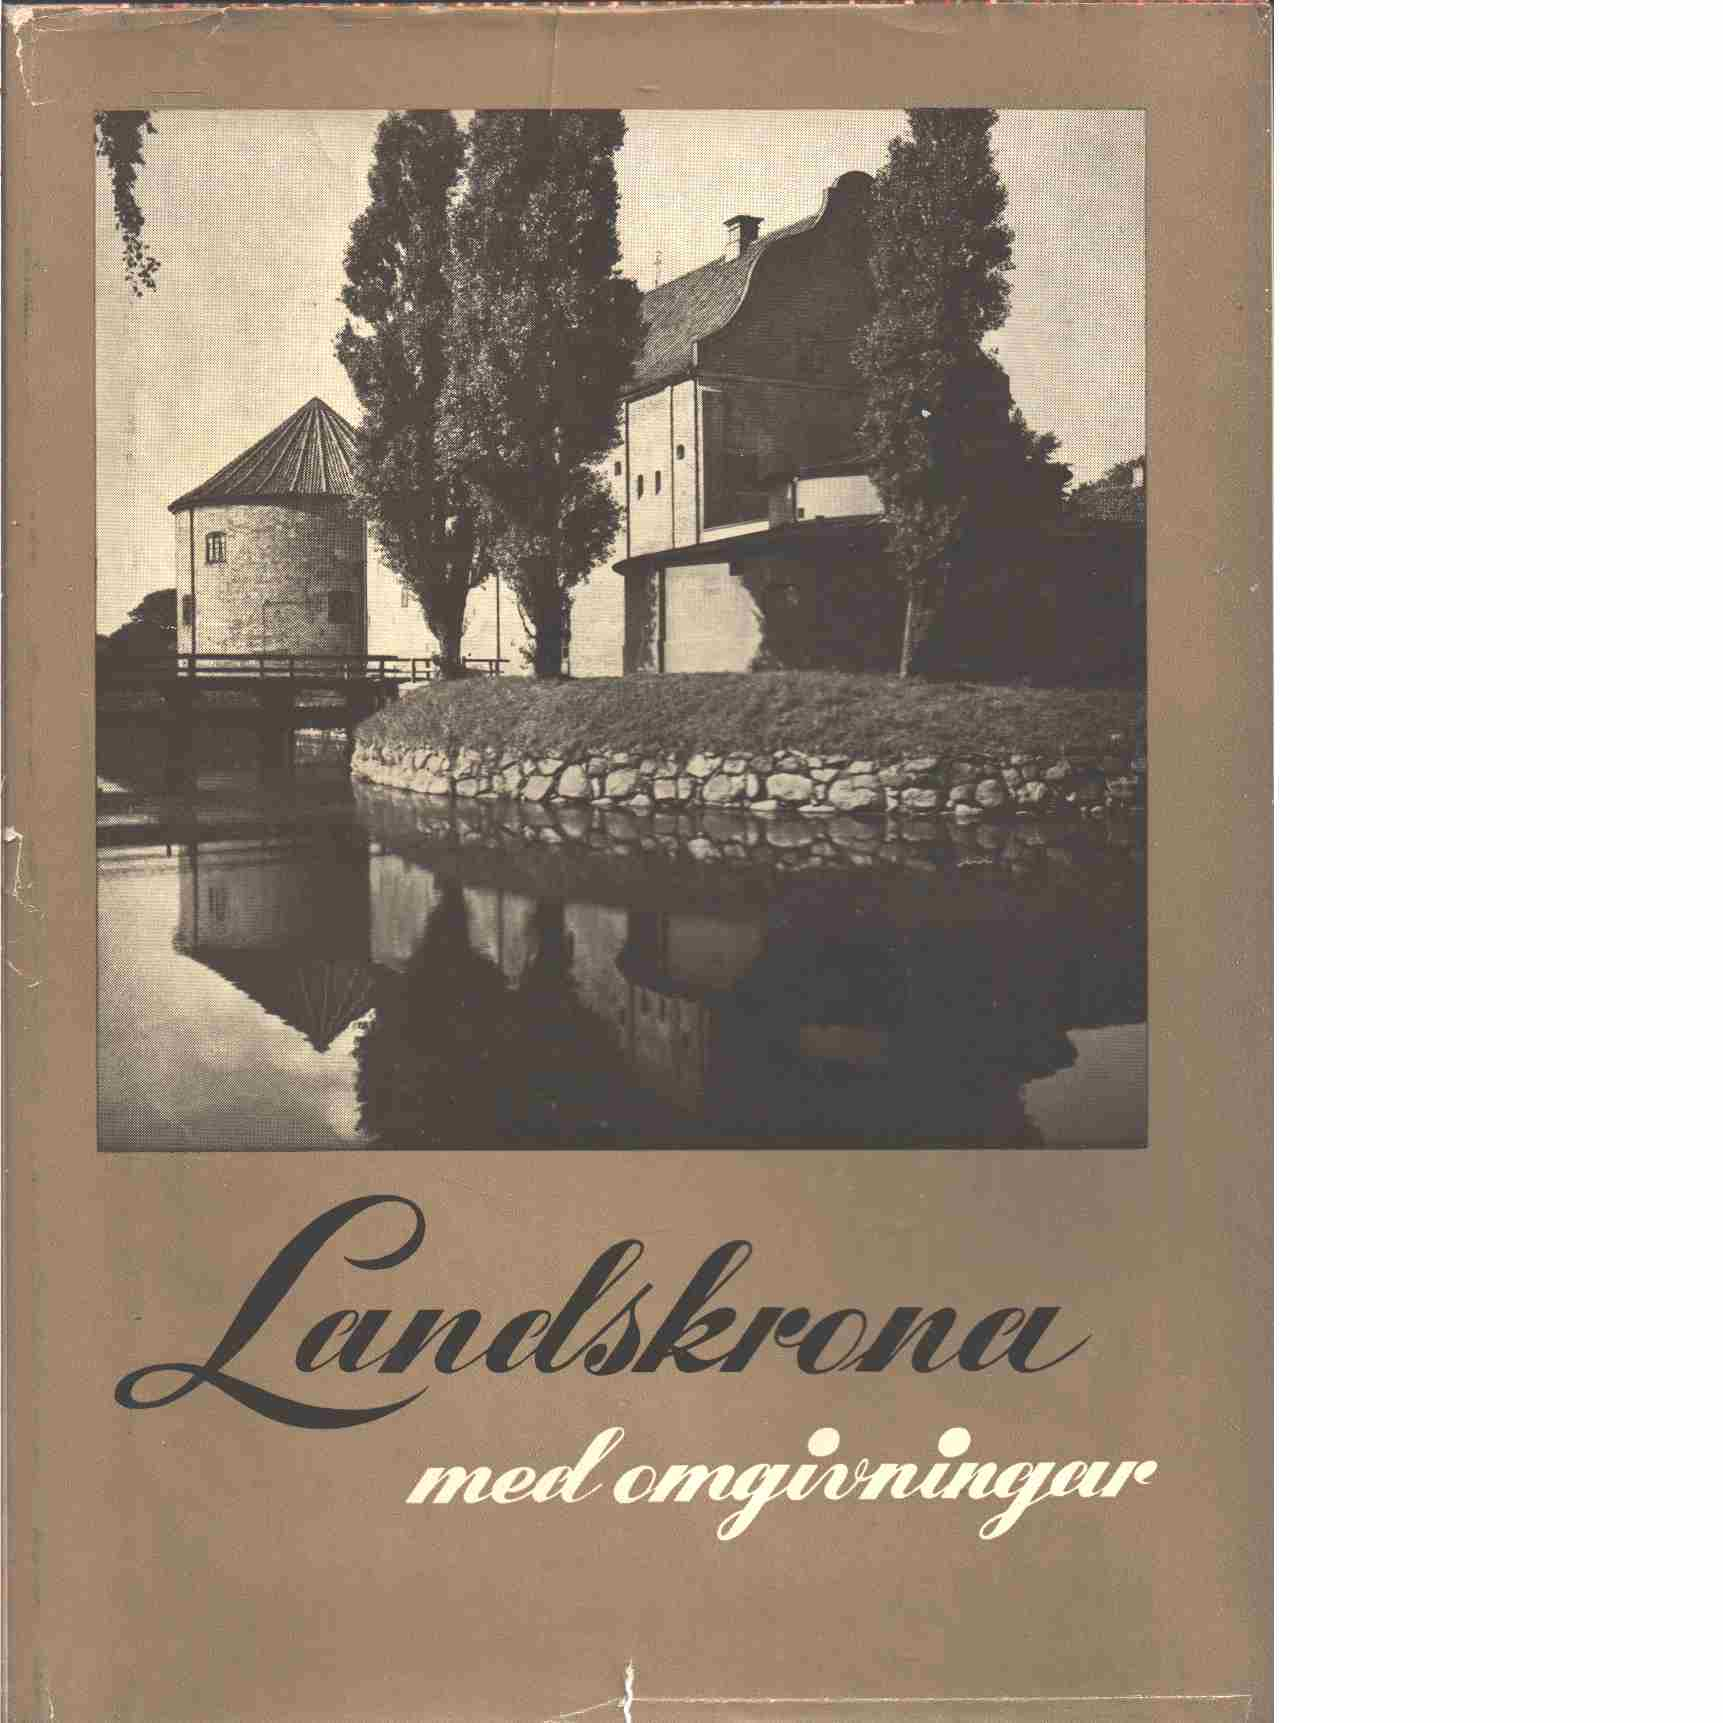 Landskrona med omgivningar  - Desaix, Sven och Bengtson, Arne